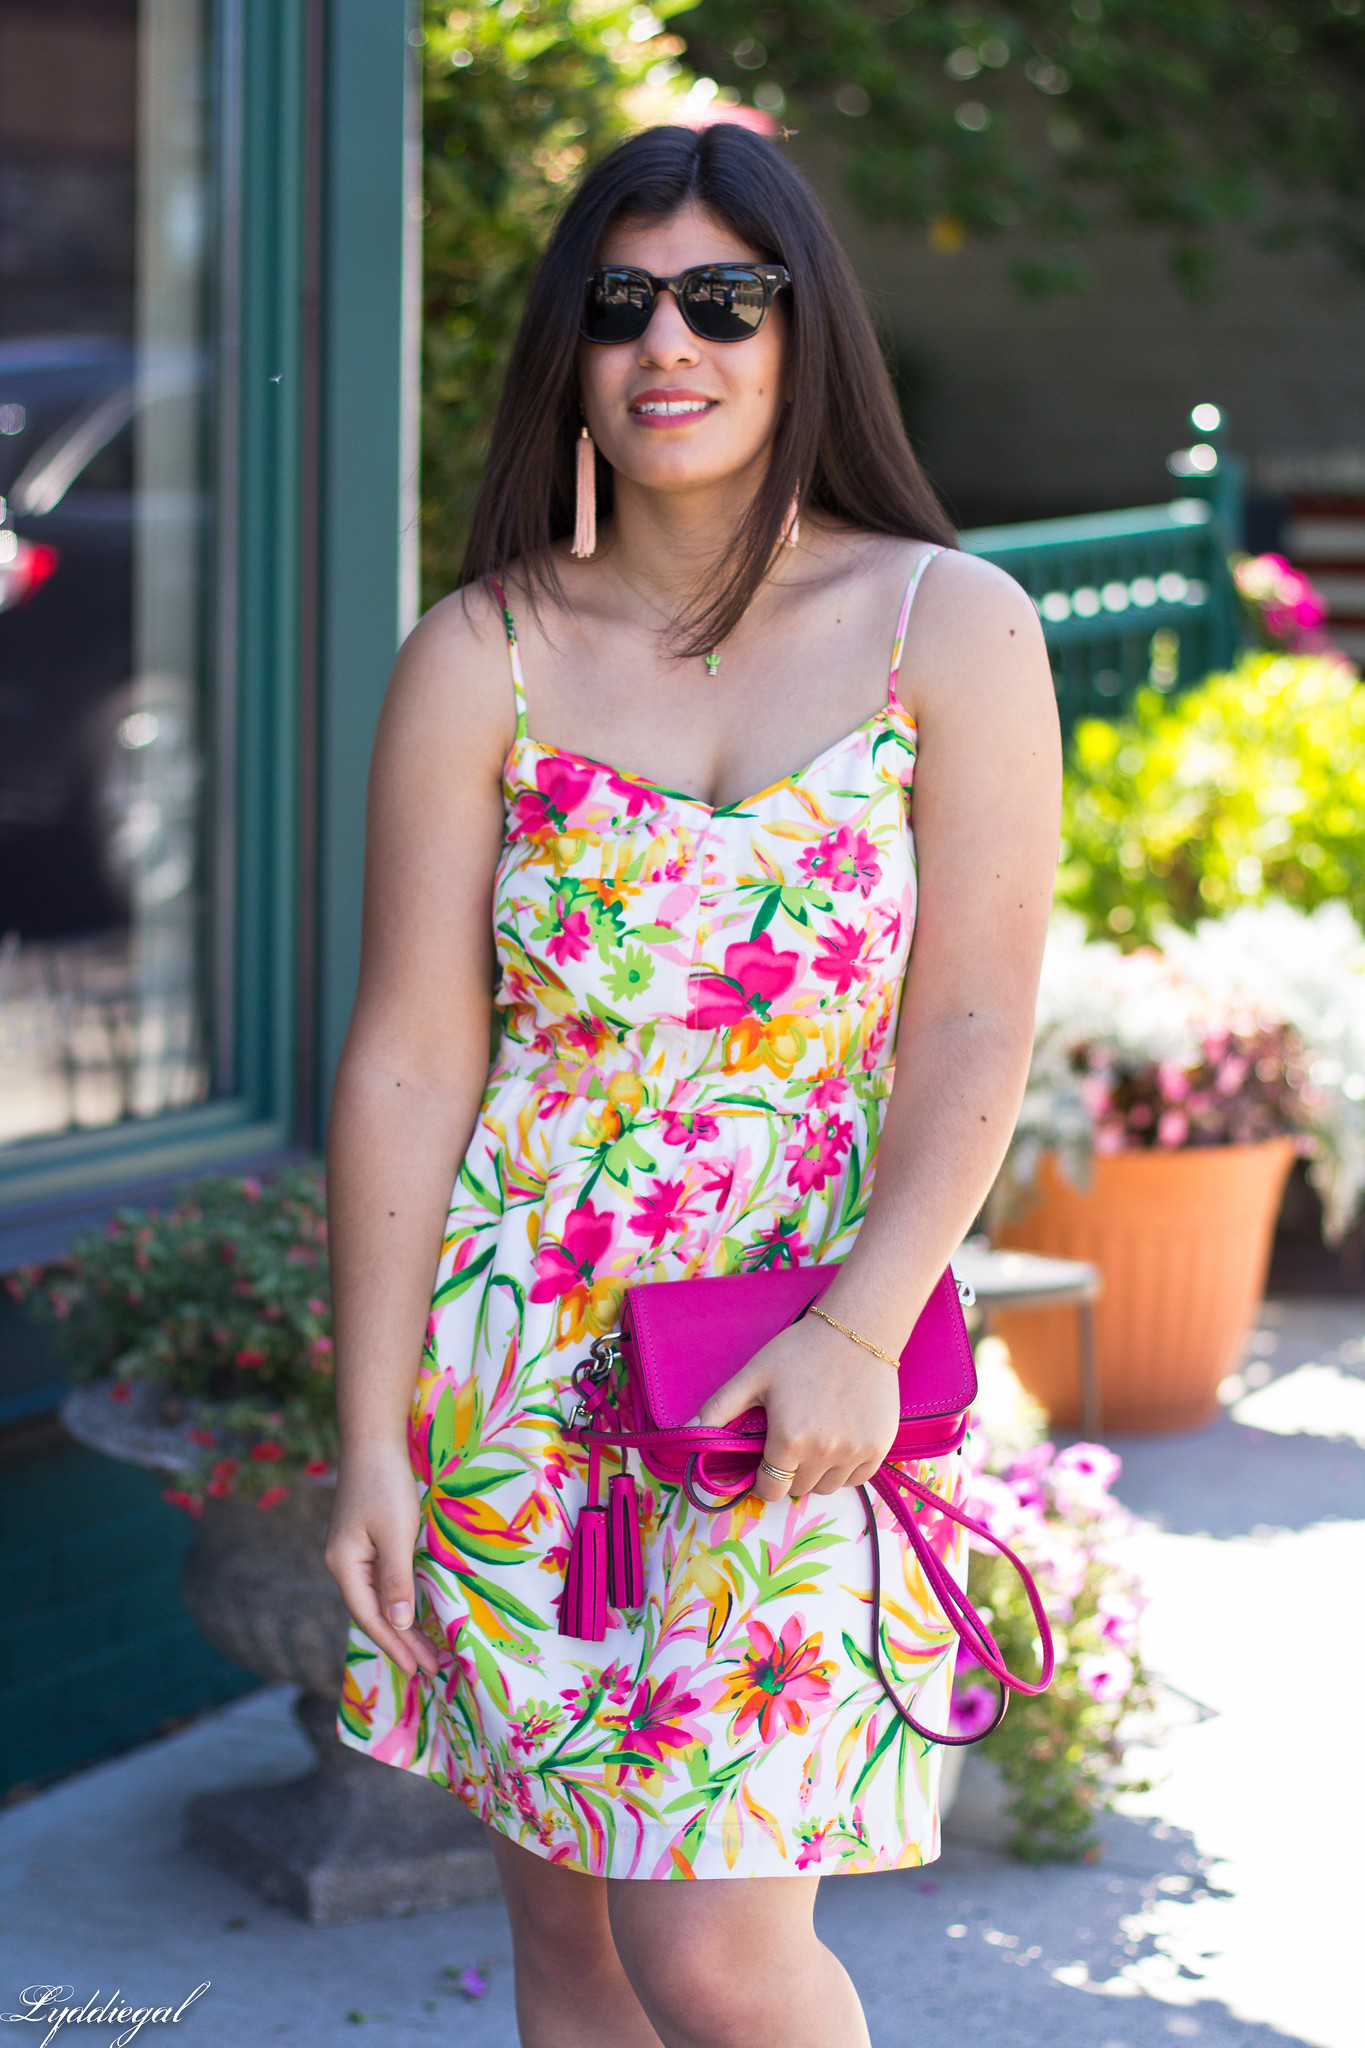 floral cami dress, pink coach bag, platform espadrilles-6.jpg